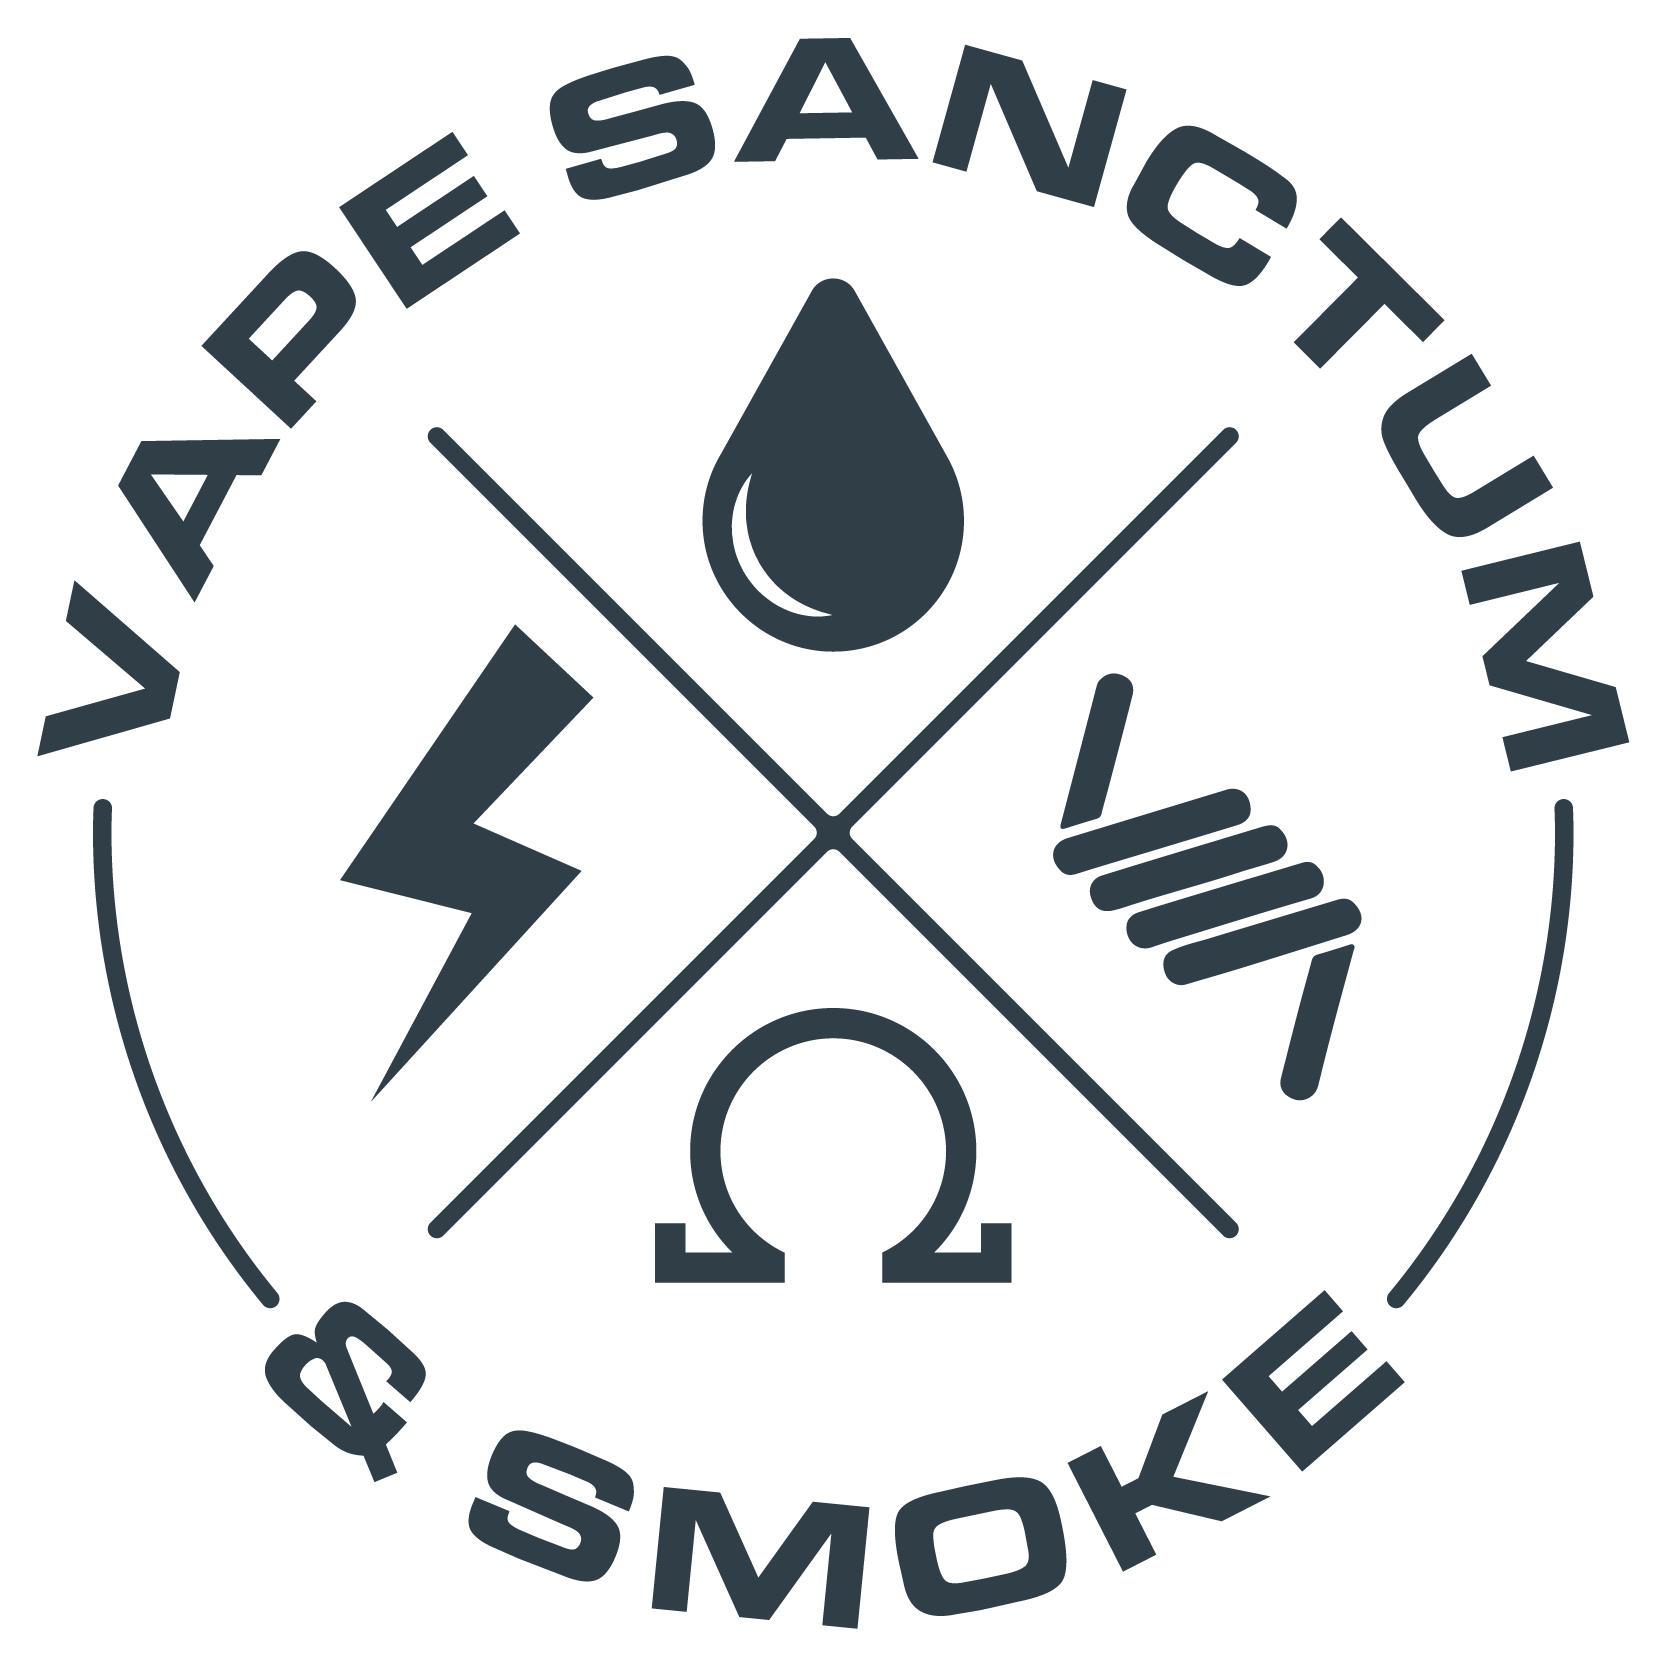 Vape Sanctum and Smoke - Fair Oaks, CA - Tobacco Shops